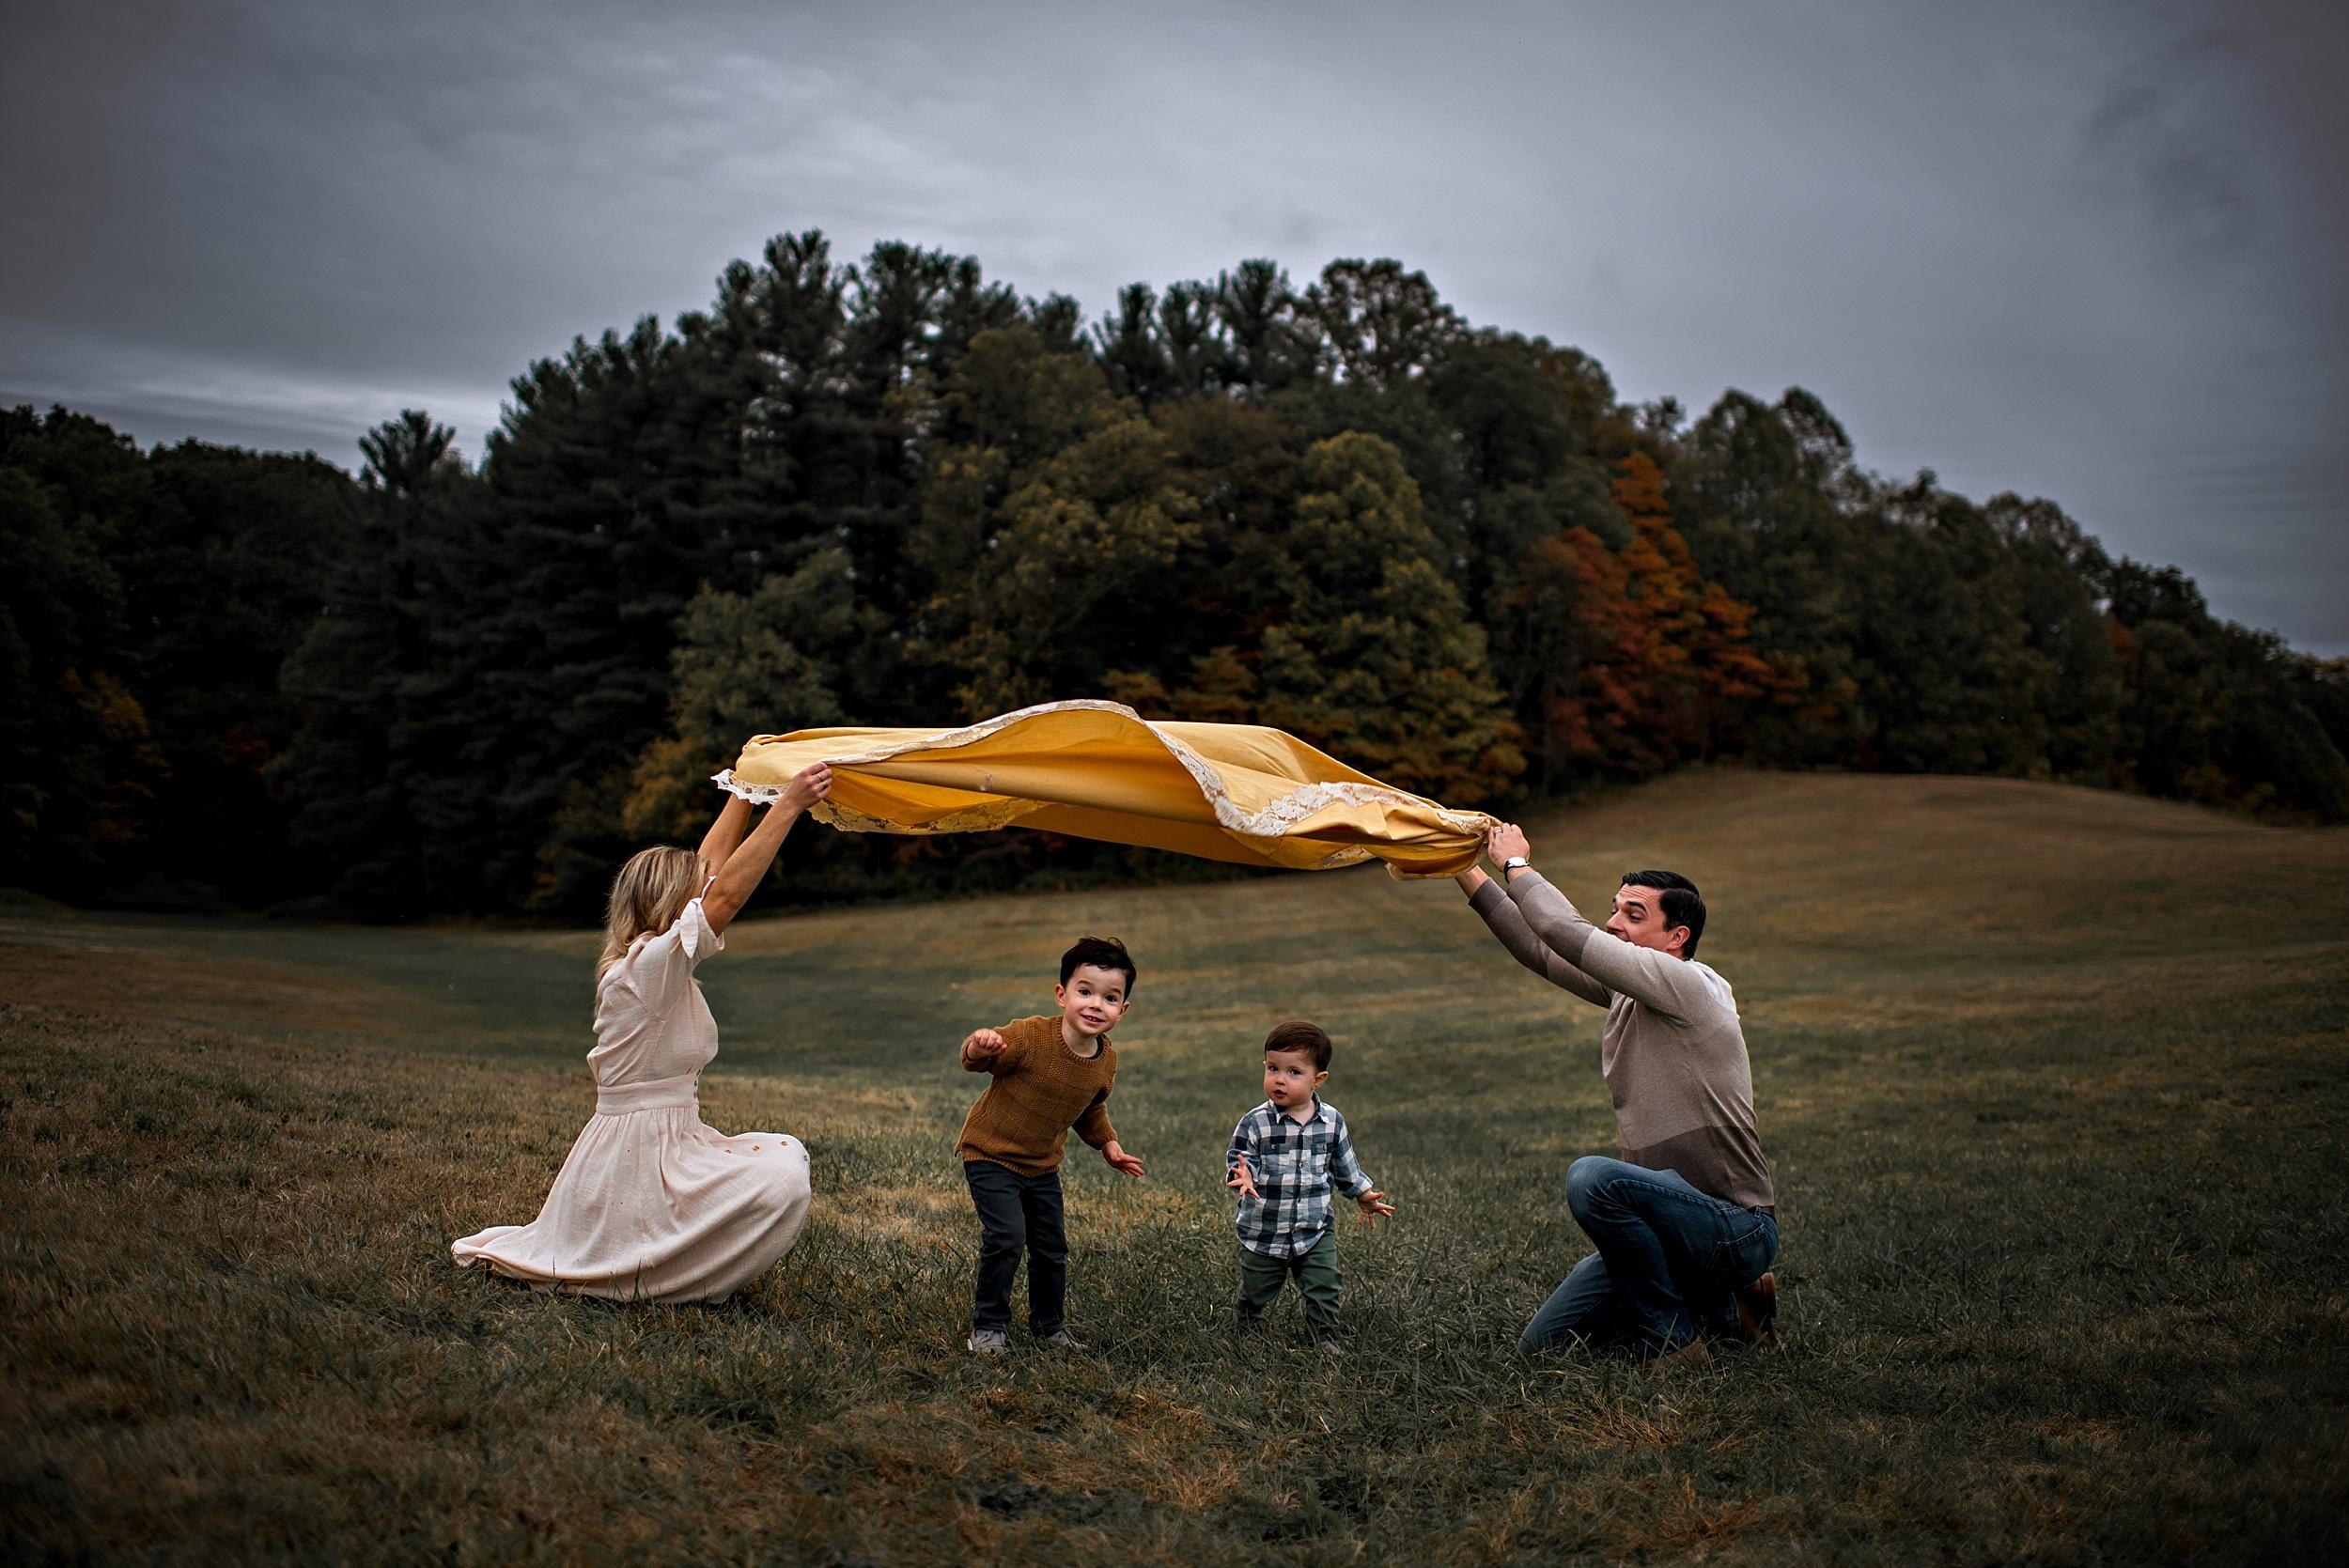 lauren-grayson-photography-portrait-artist-akron-cleveland-ohio-photographer-family-session-fields-sunset-fall_0198.jpg